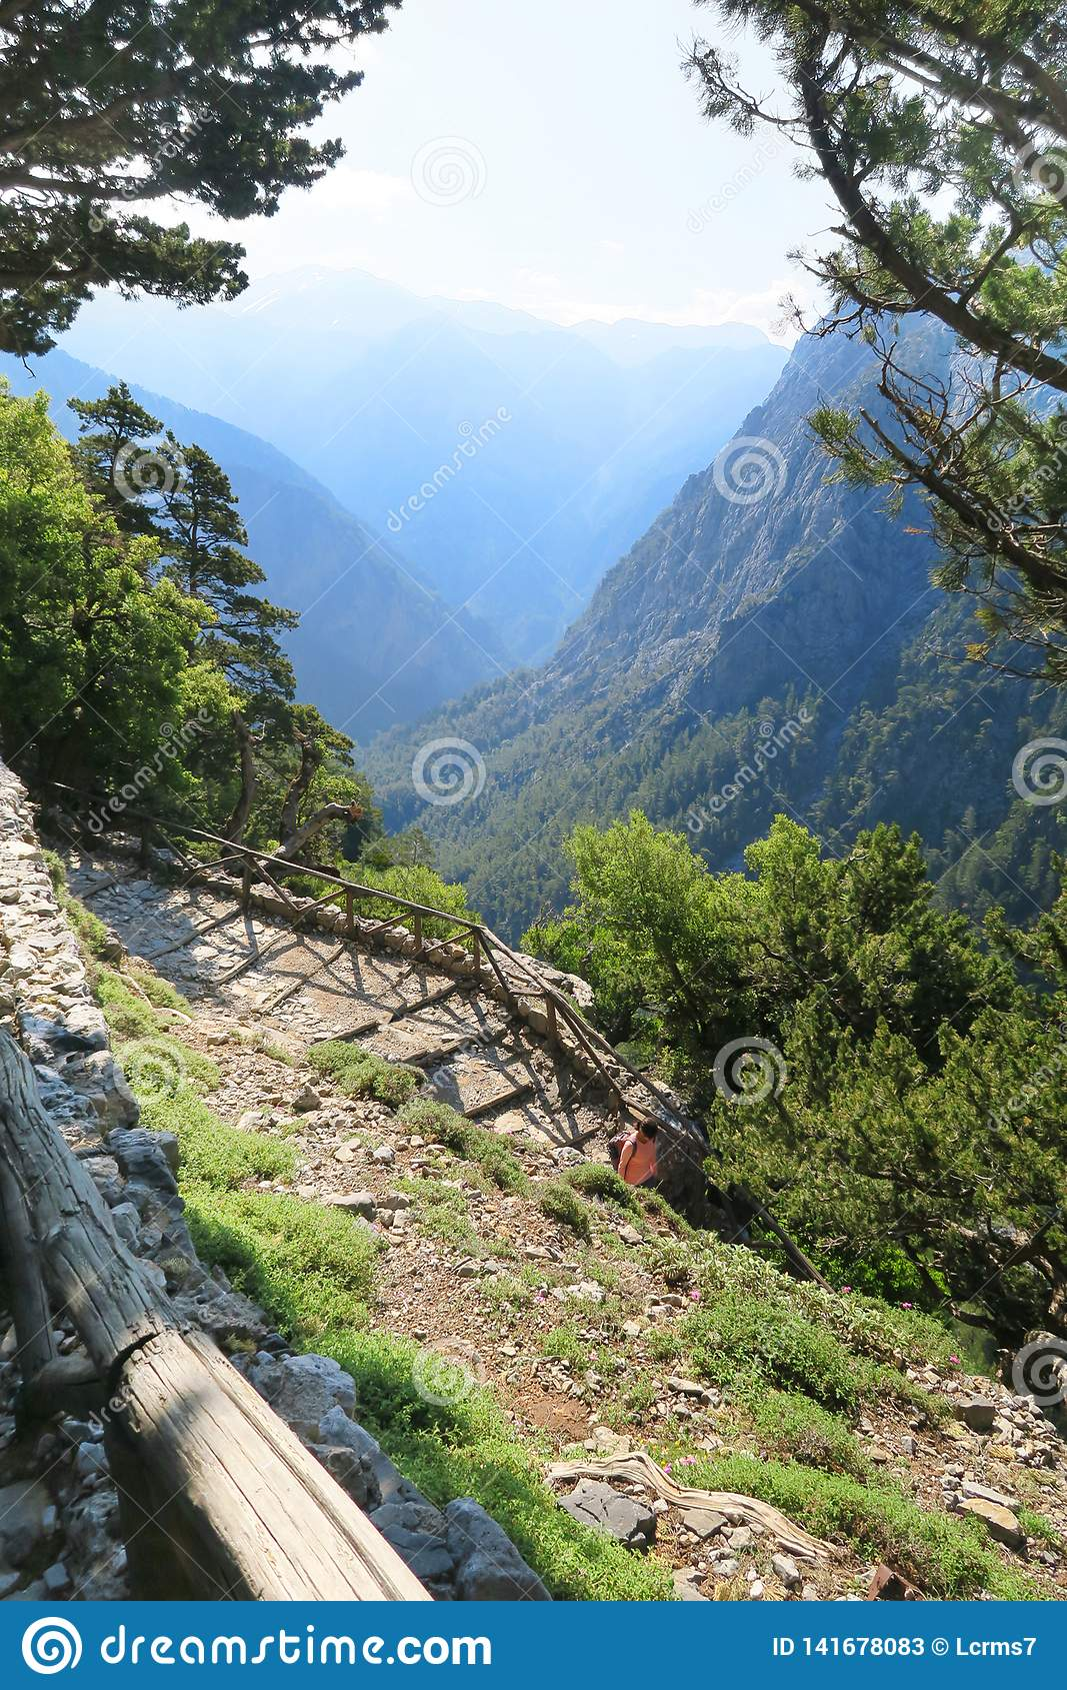 Samaria Gorge at Crete Greece hiking path